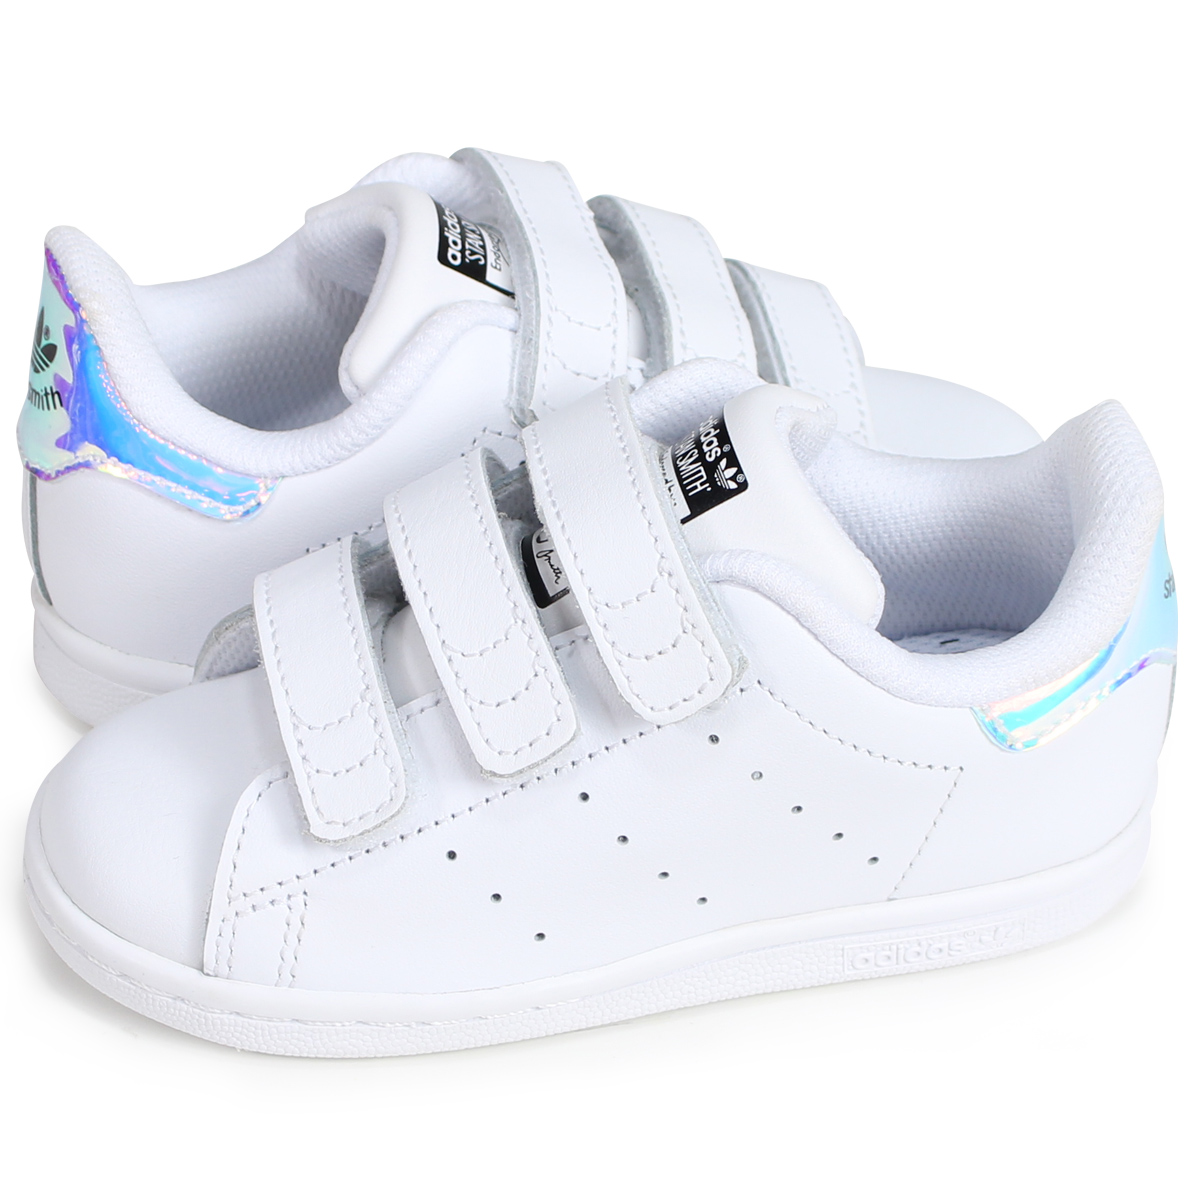 Adidas Originals Stan Smith CF C PS Younger Kids´s Adidas Originals Prix Shoe White Official Adidas Shoes Prix 2019 France